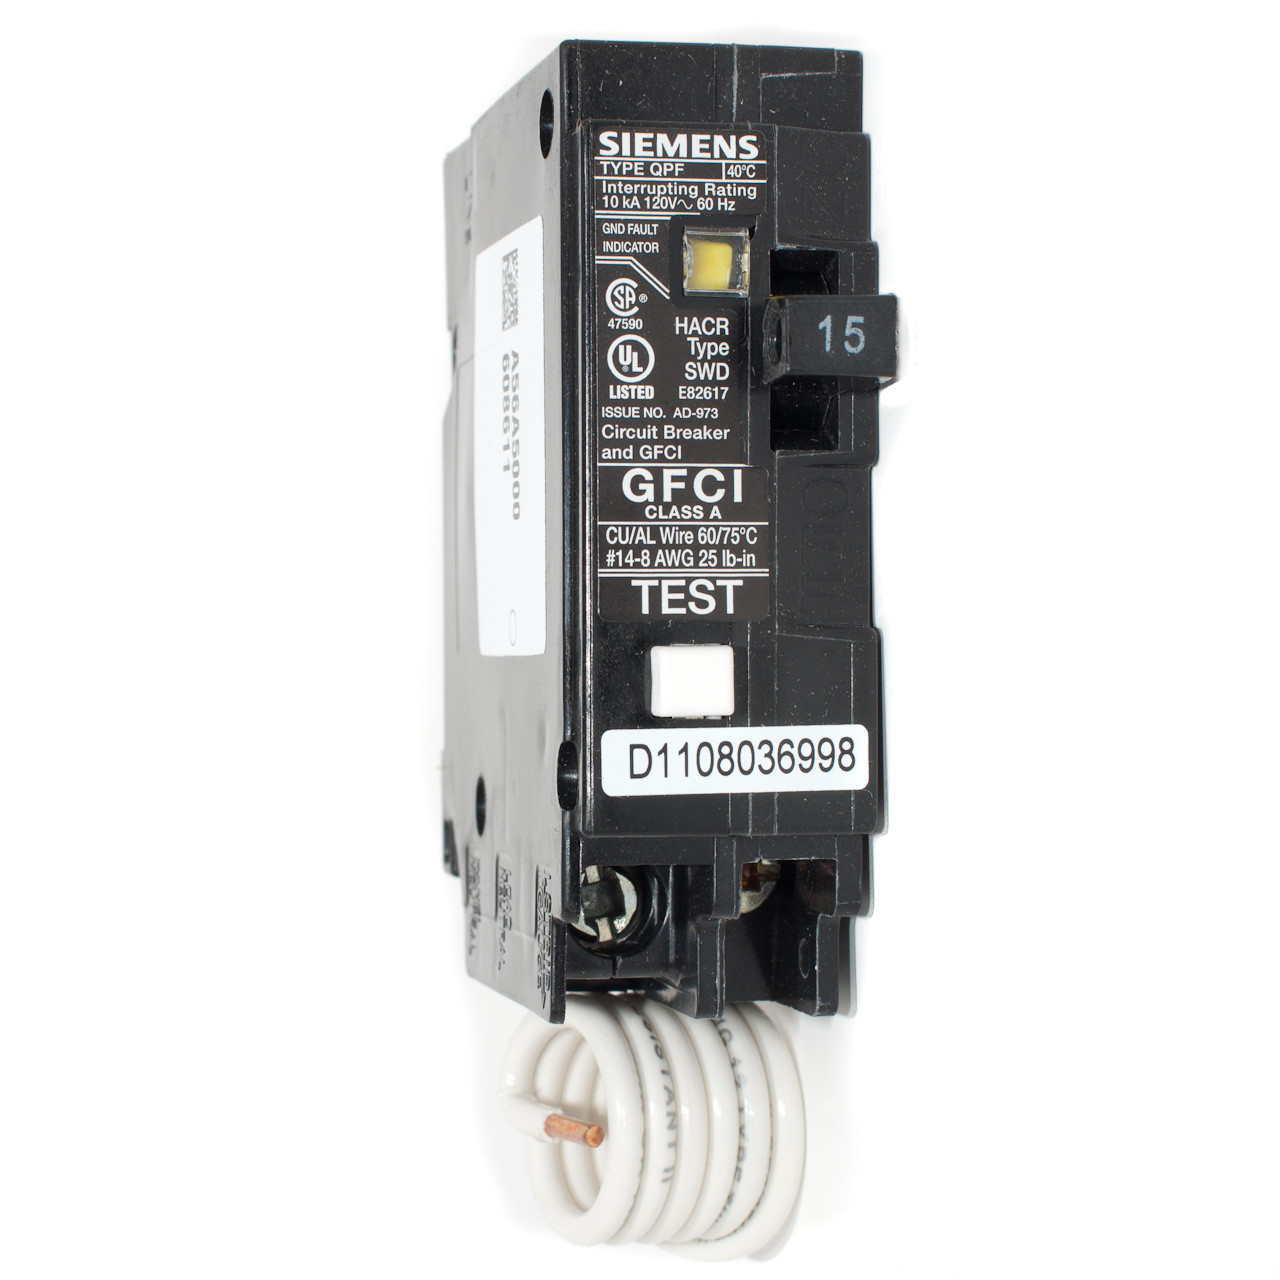 Gfci Circuit Breaker Perfect 220 Volt How To Test A Fine Siemens 15a Single Pole Pushon Throughout